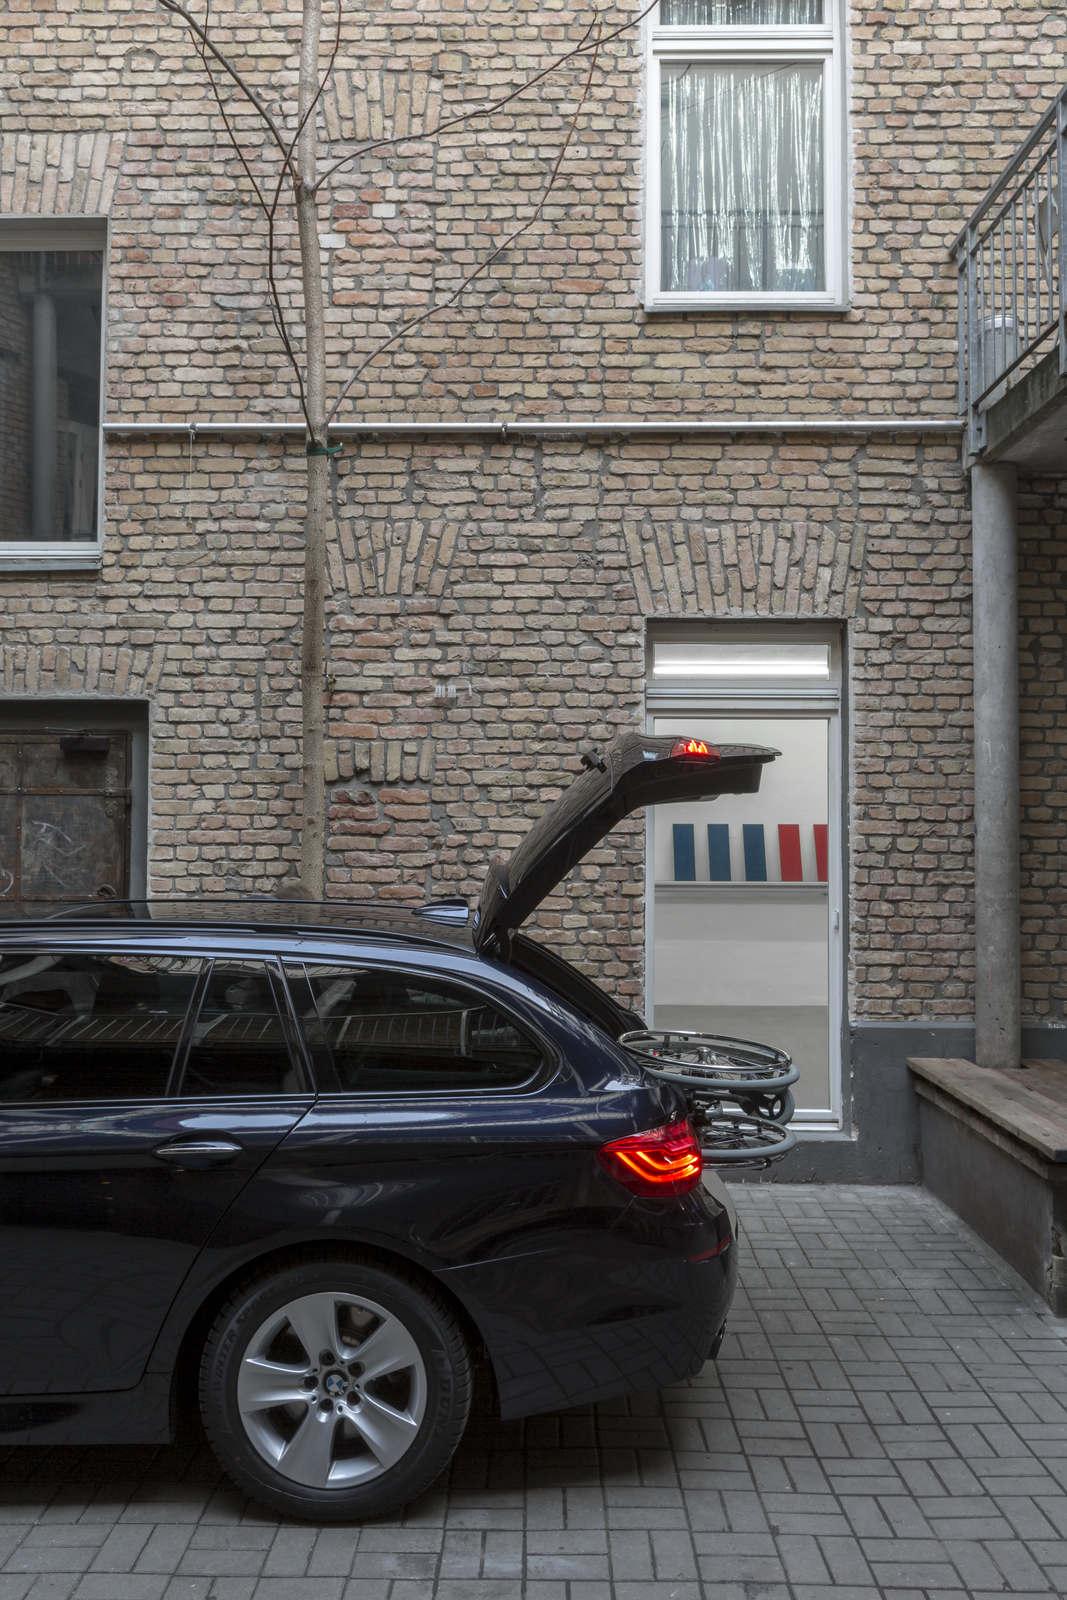 Matthias_Sohr_ACUD_gallery_02_installation_view